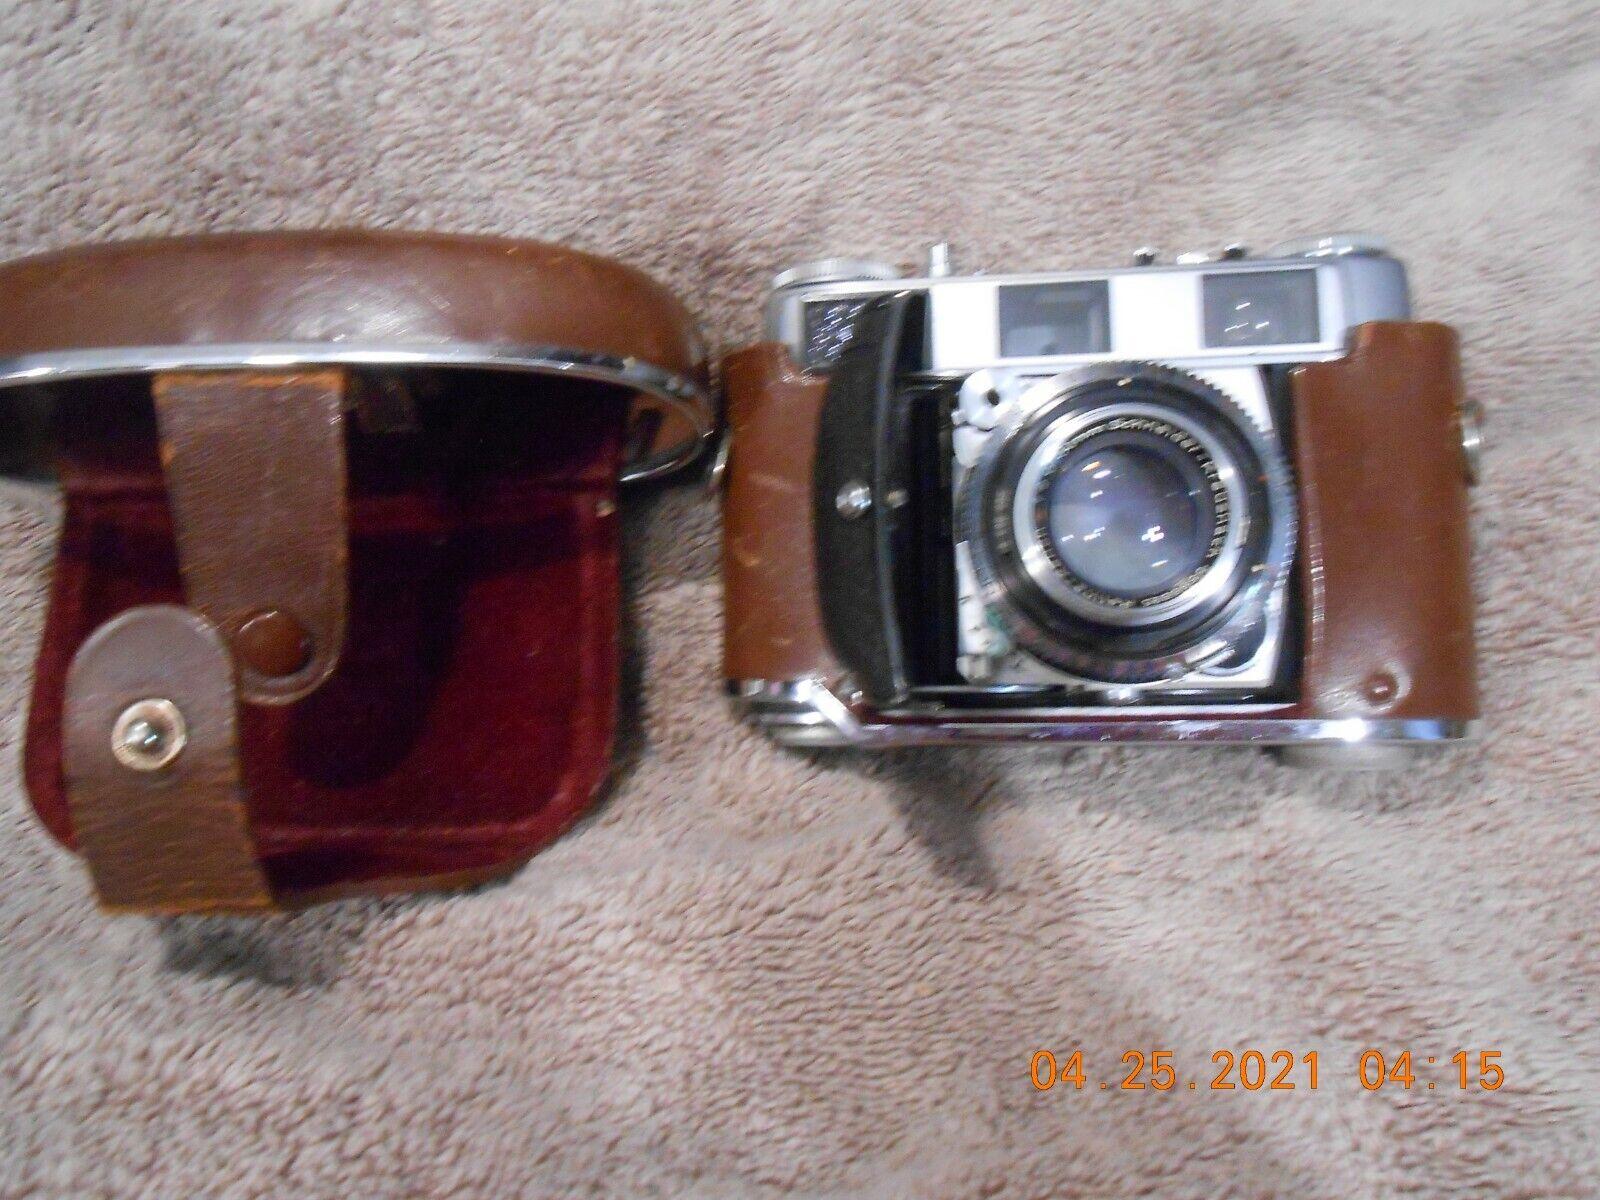 Kodak Retina IIIC 35mm Film Rangefinder Camera Schneider-Kreuznach 50mm F2 Lens - $229.99